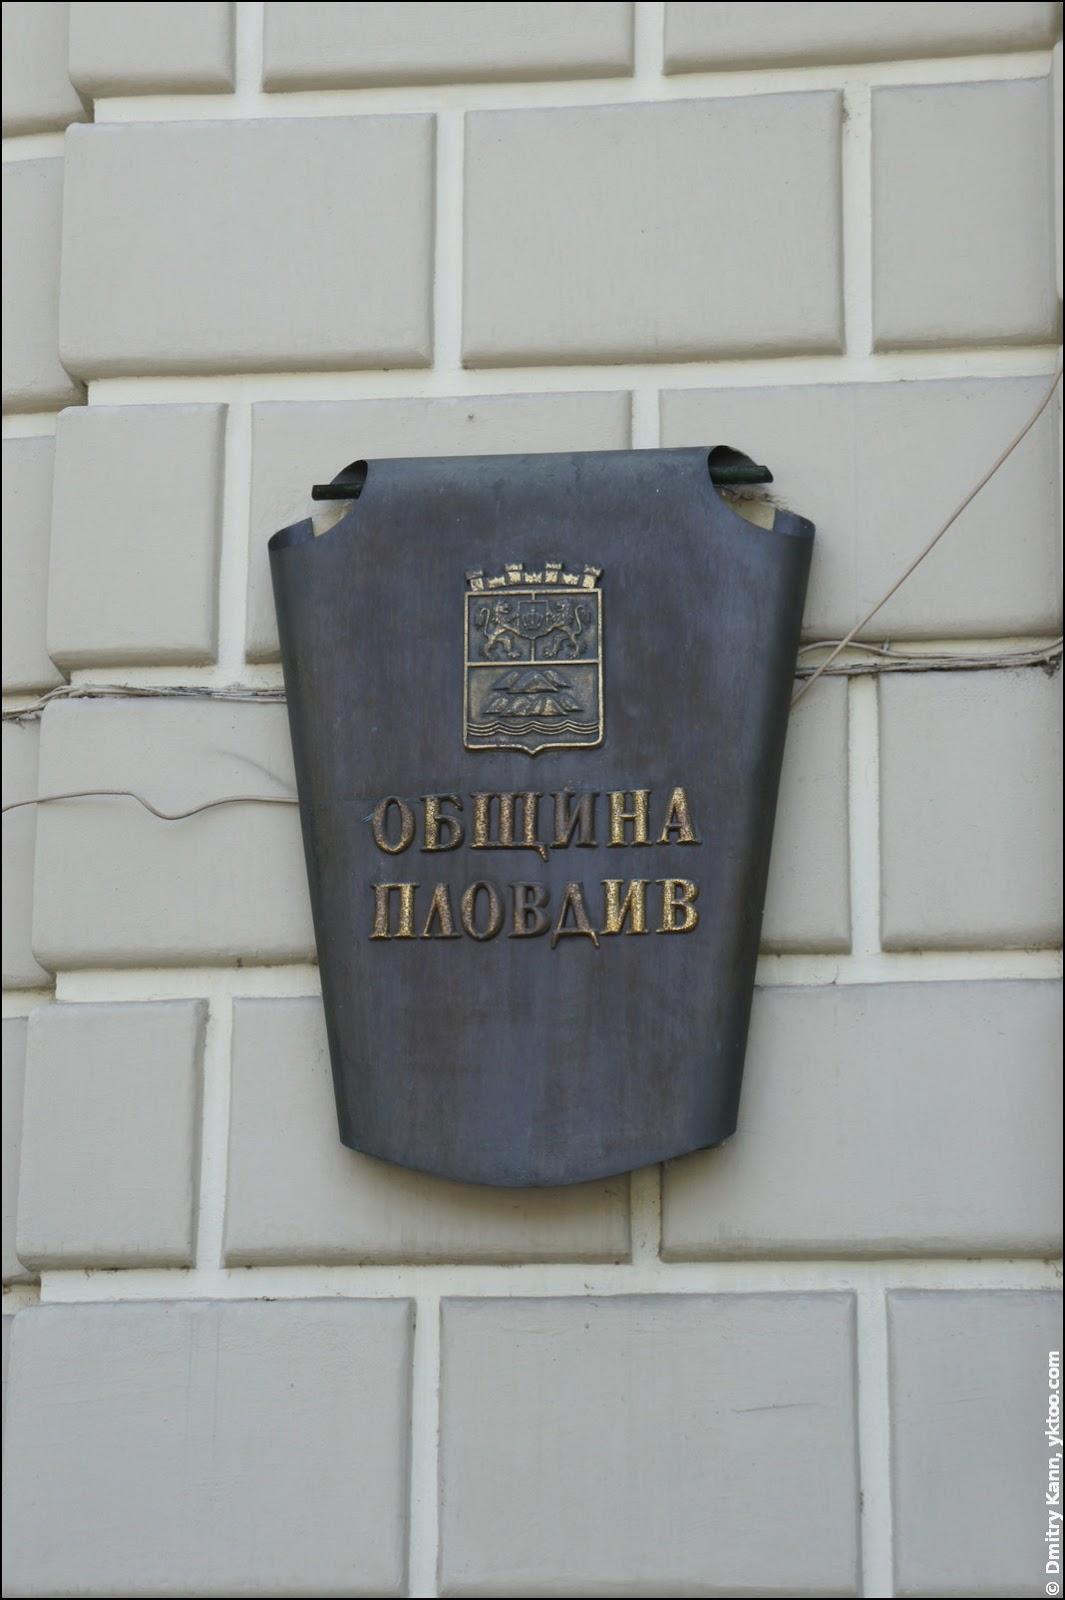 Plovdiv City-Hall.